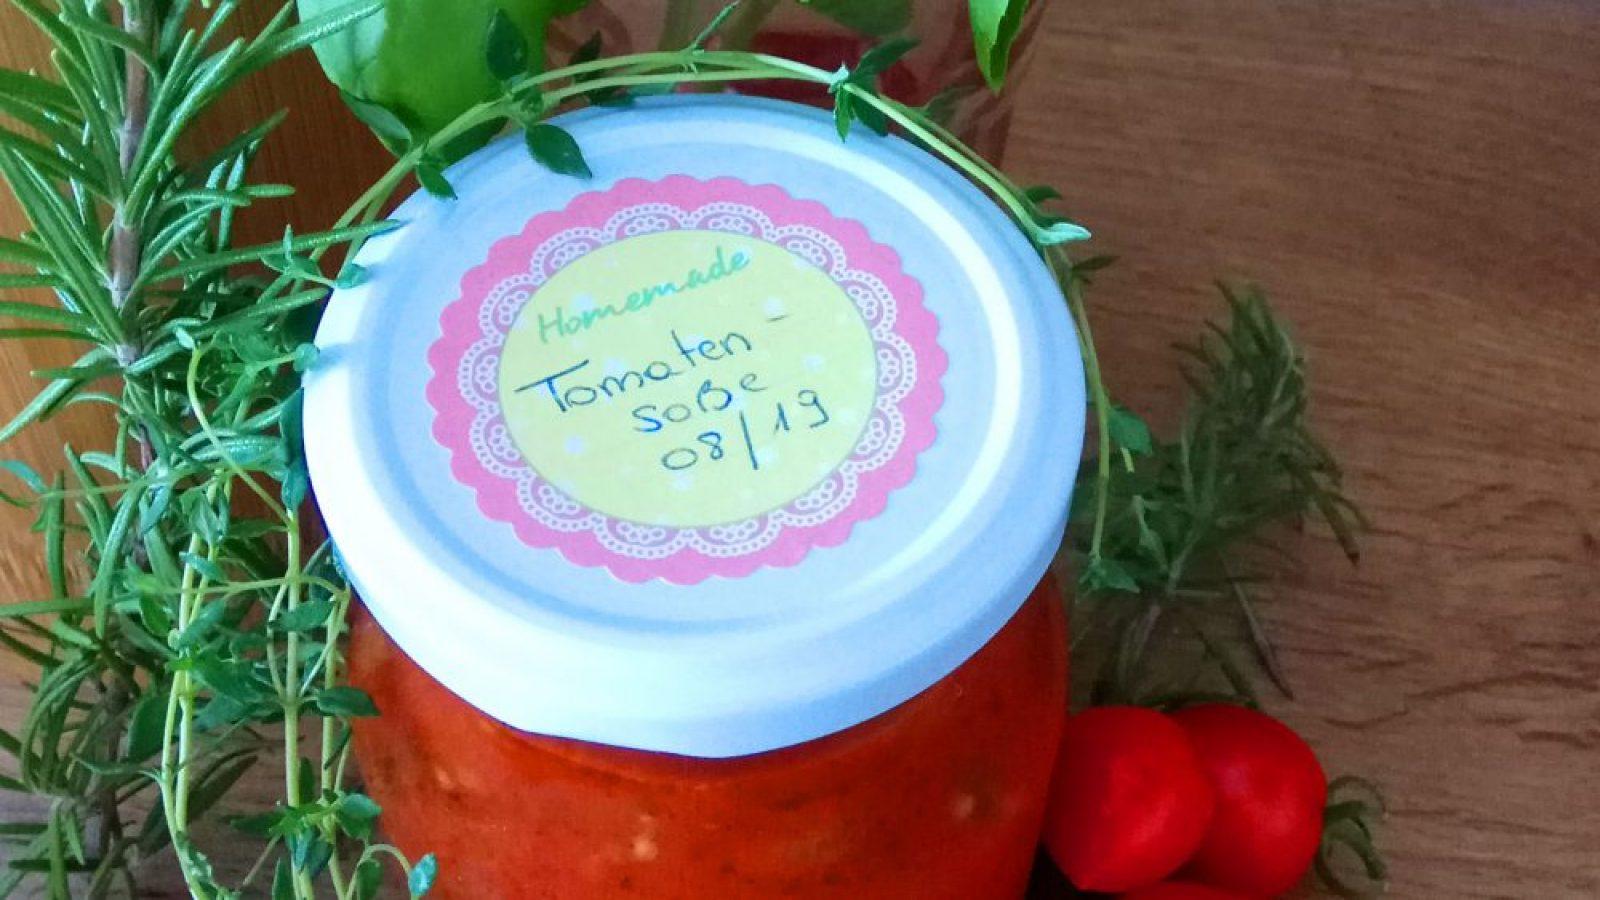 Tomatensoße mit Rosmarin, Thymian und Basilikum